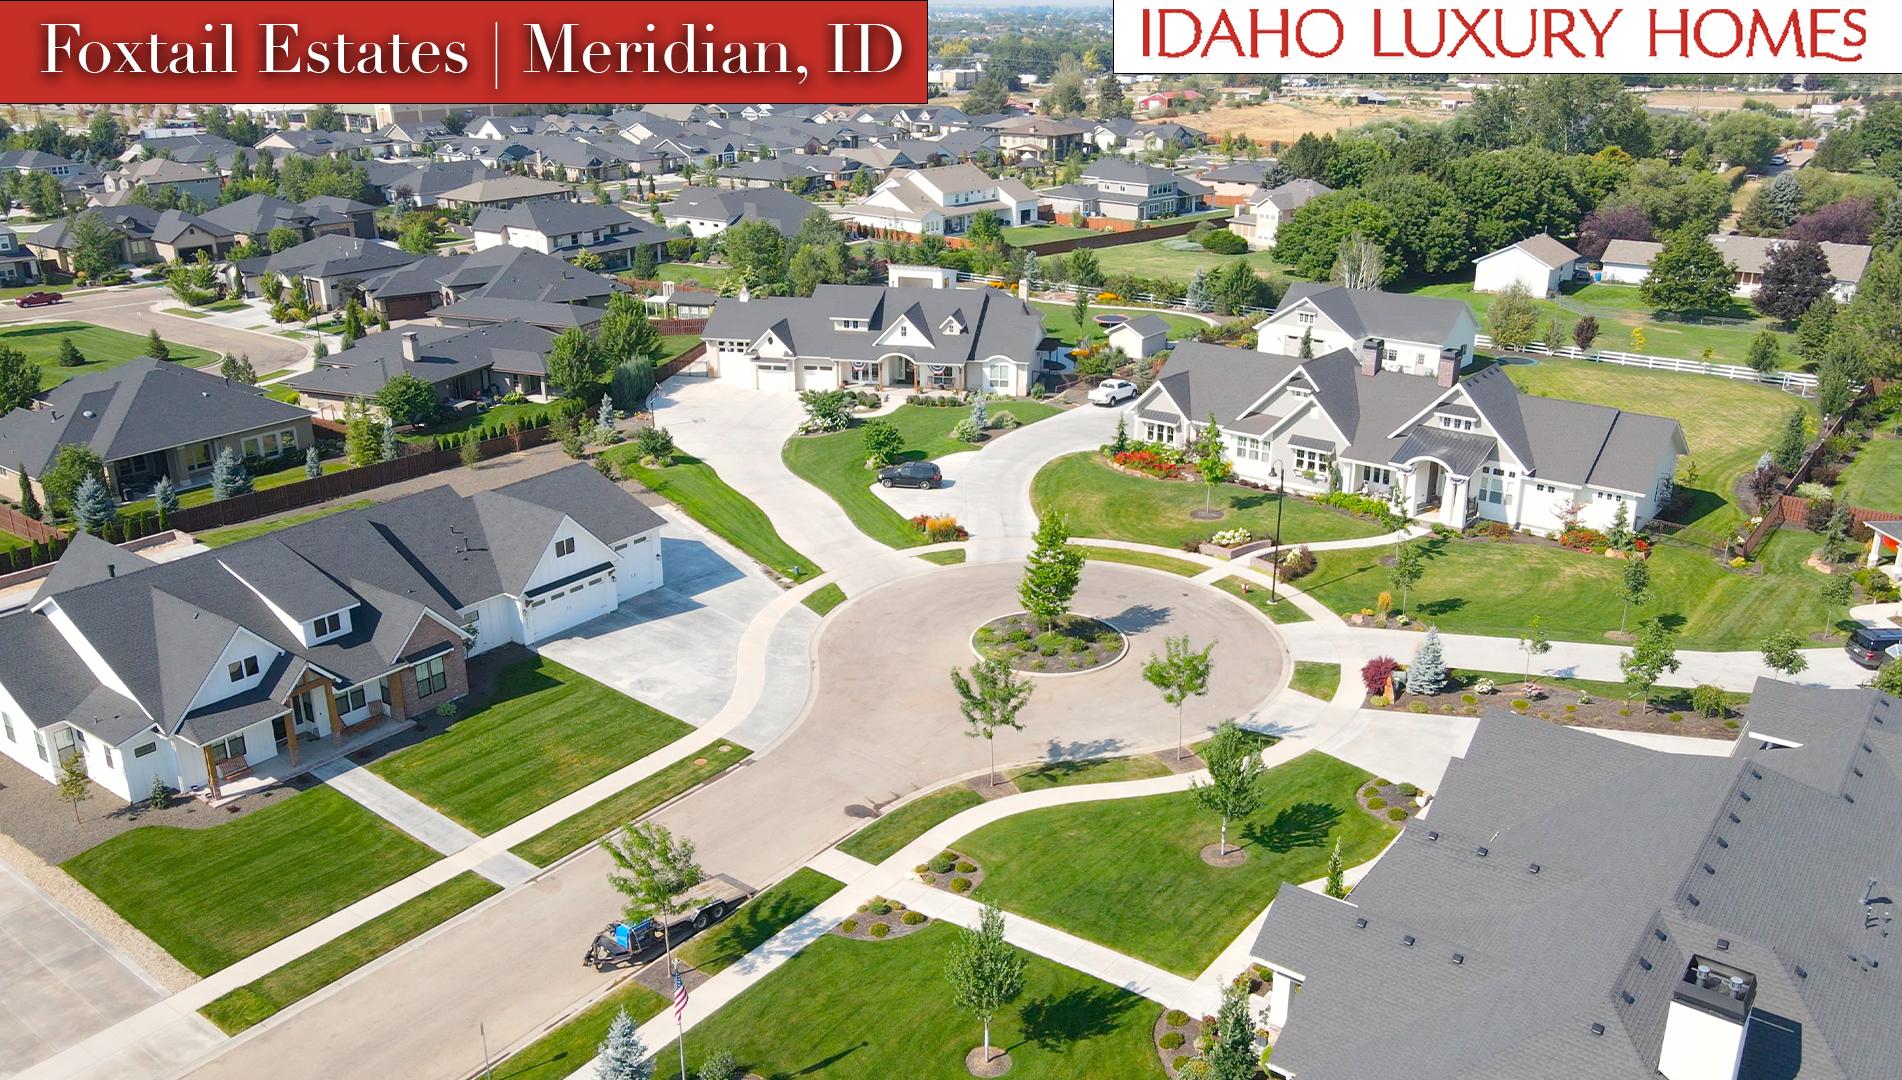 Foxtail Estates Real Estate